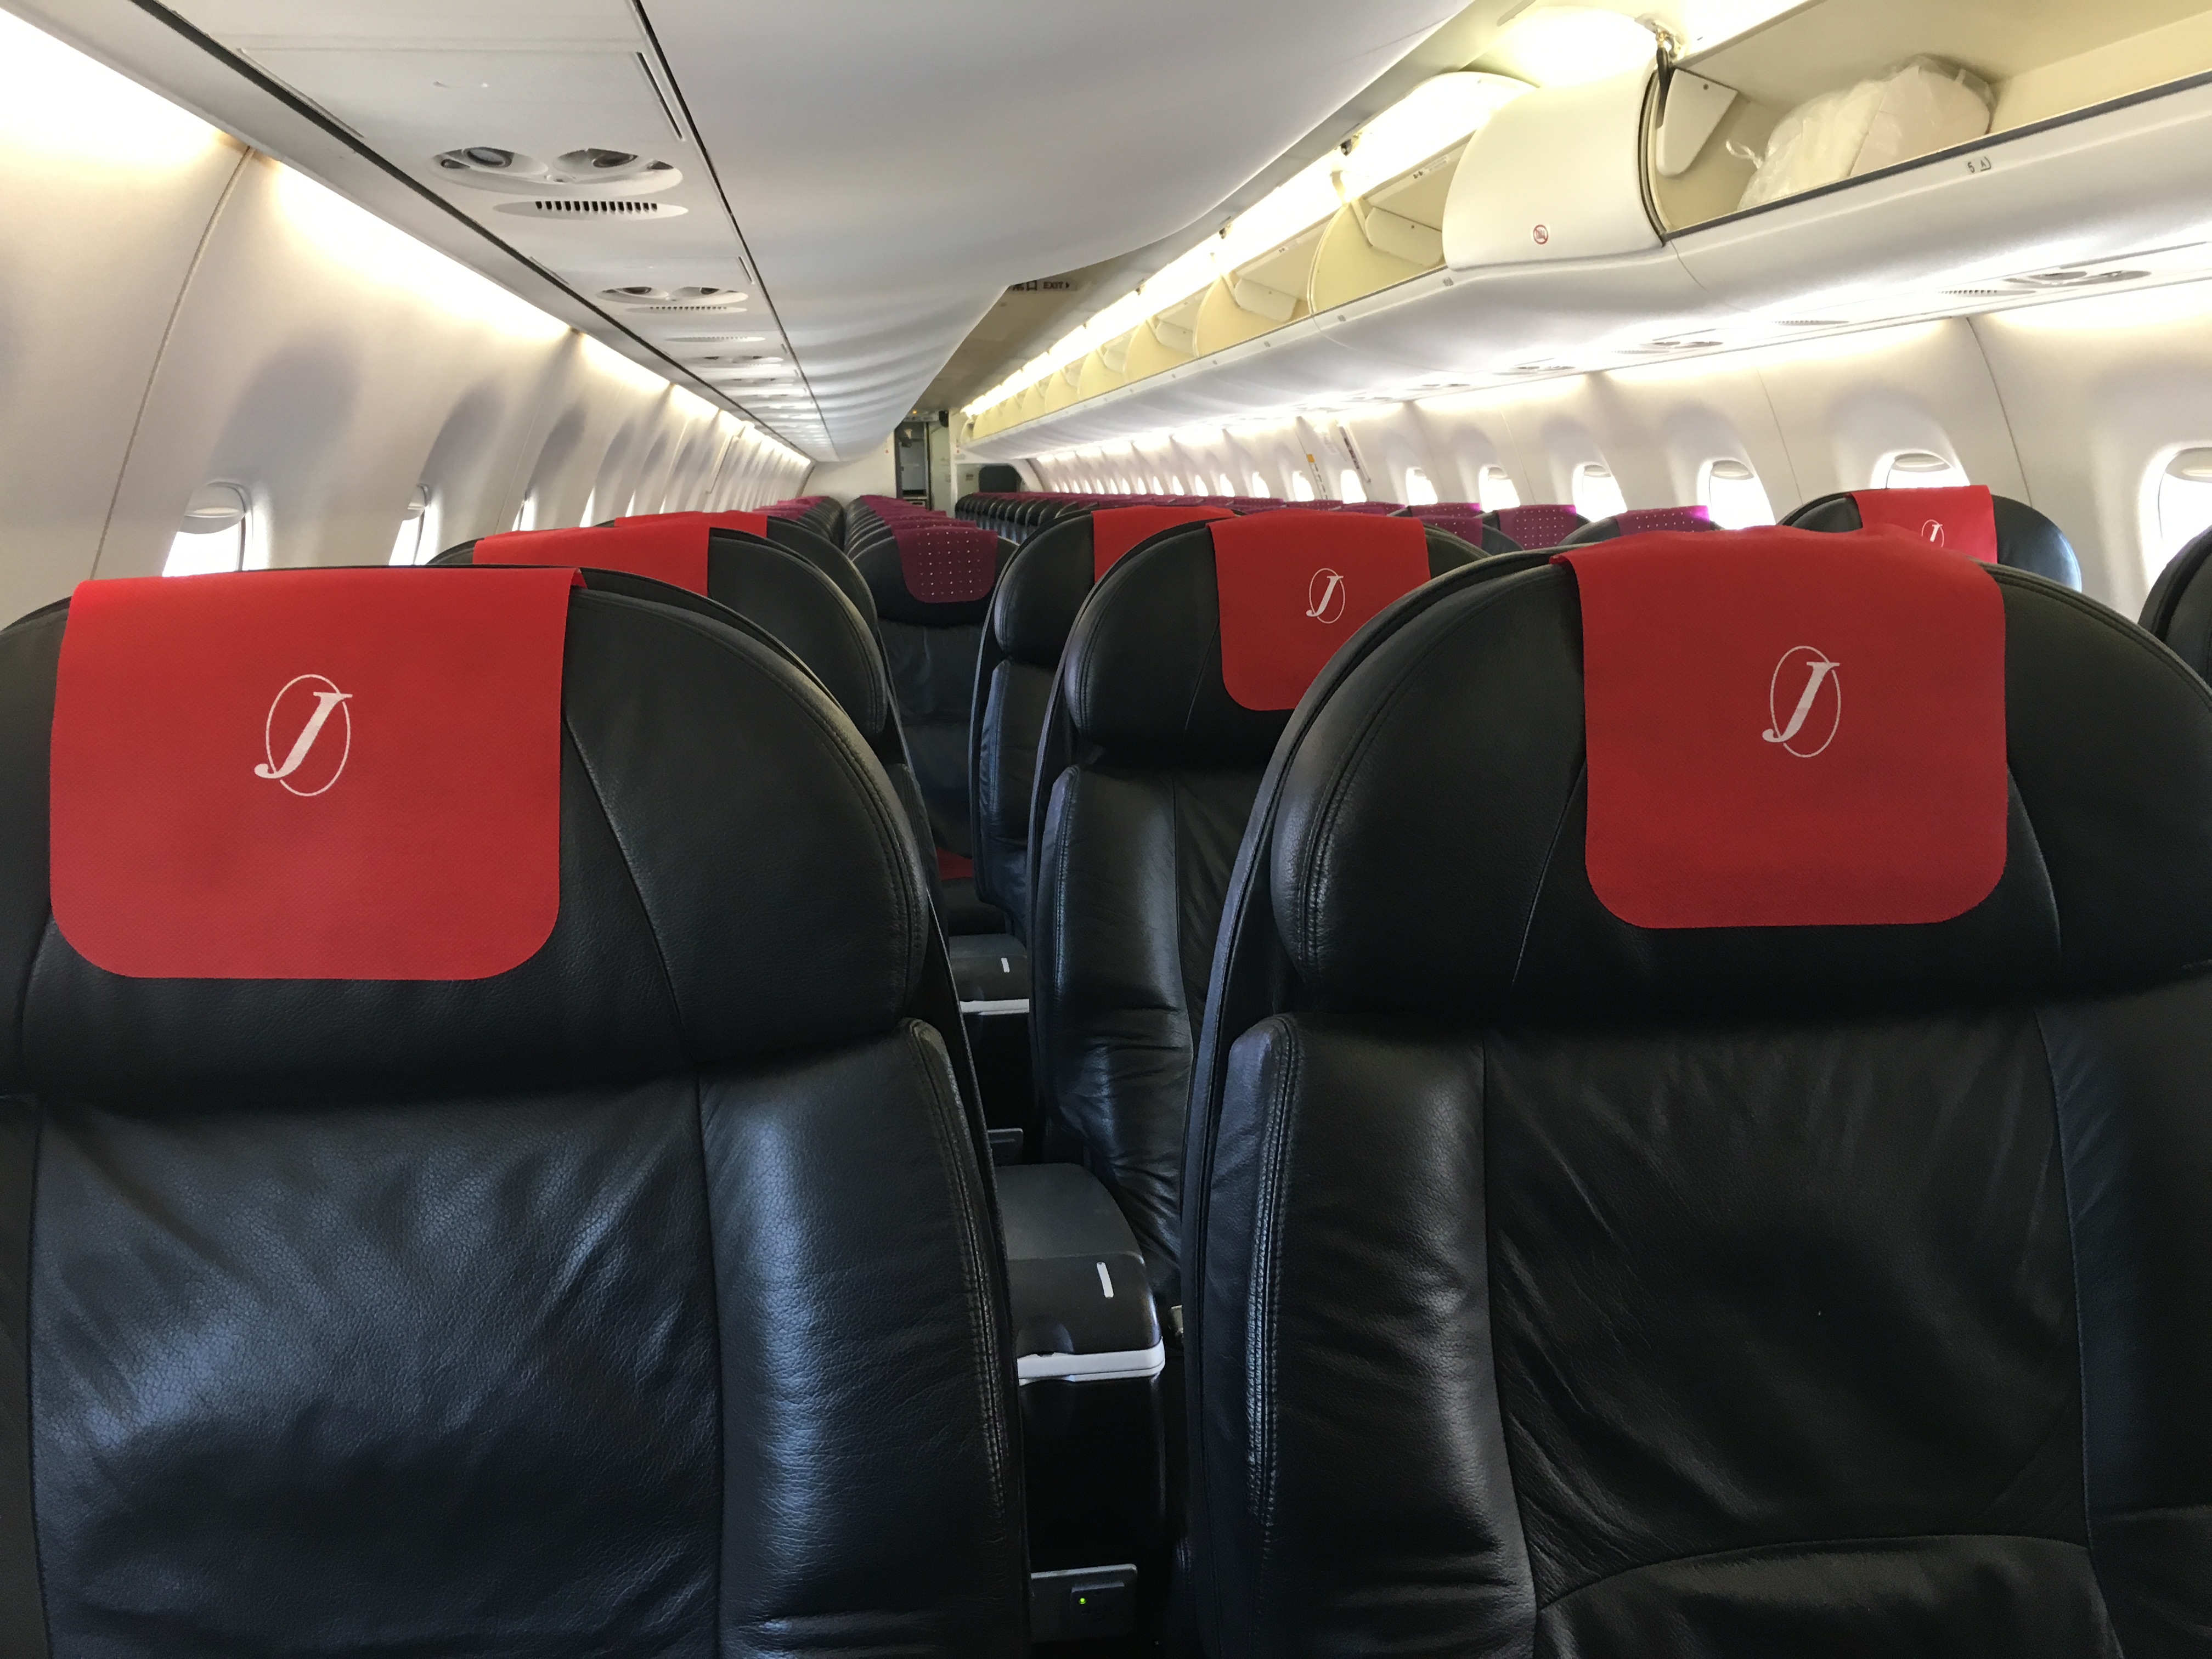 JAL(JL)のフライトがアメリカン航空(AA)のオンライン特典航空券サイトで予約可能に!